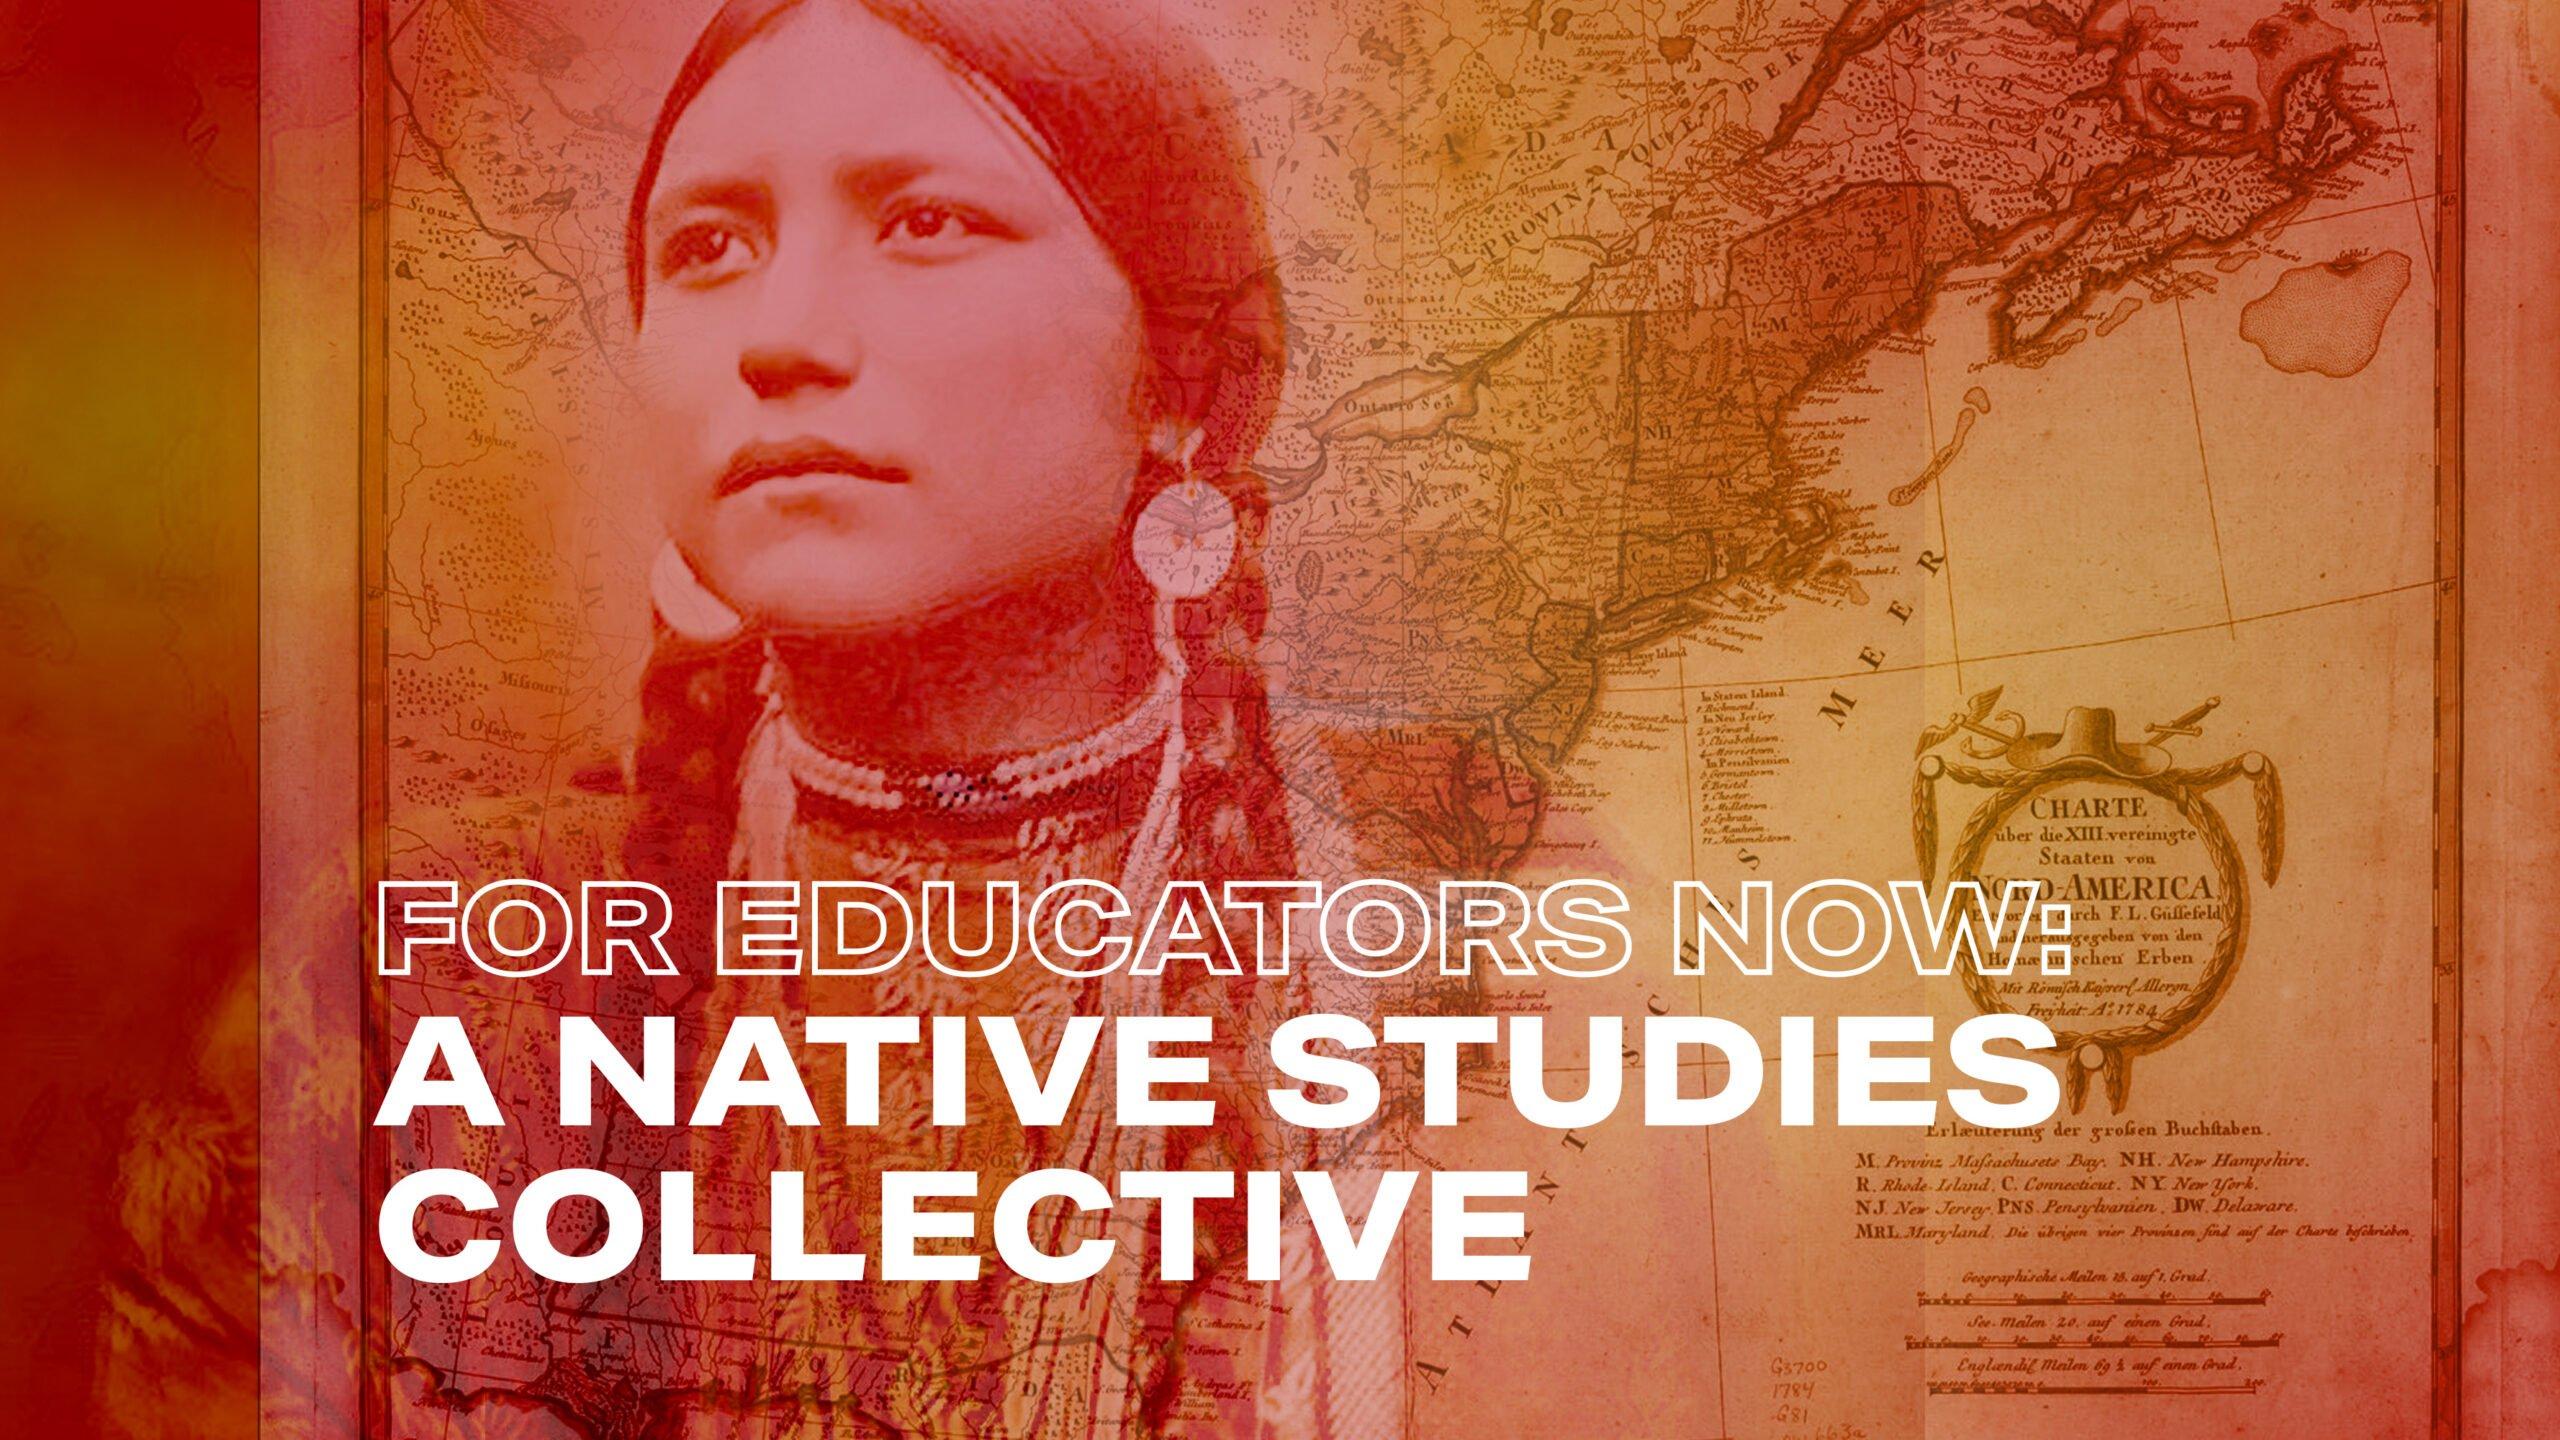 04_native-studies-collective